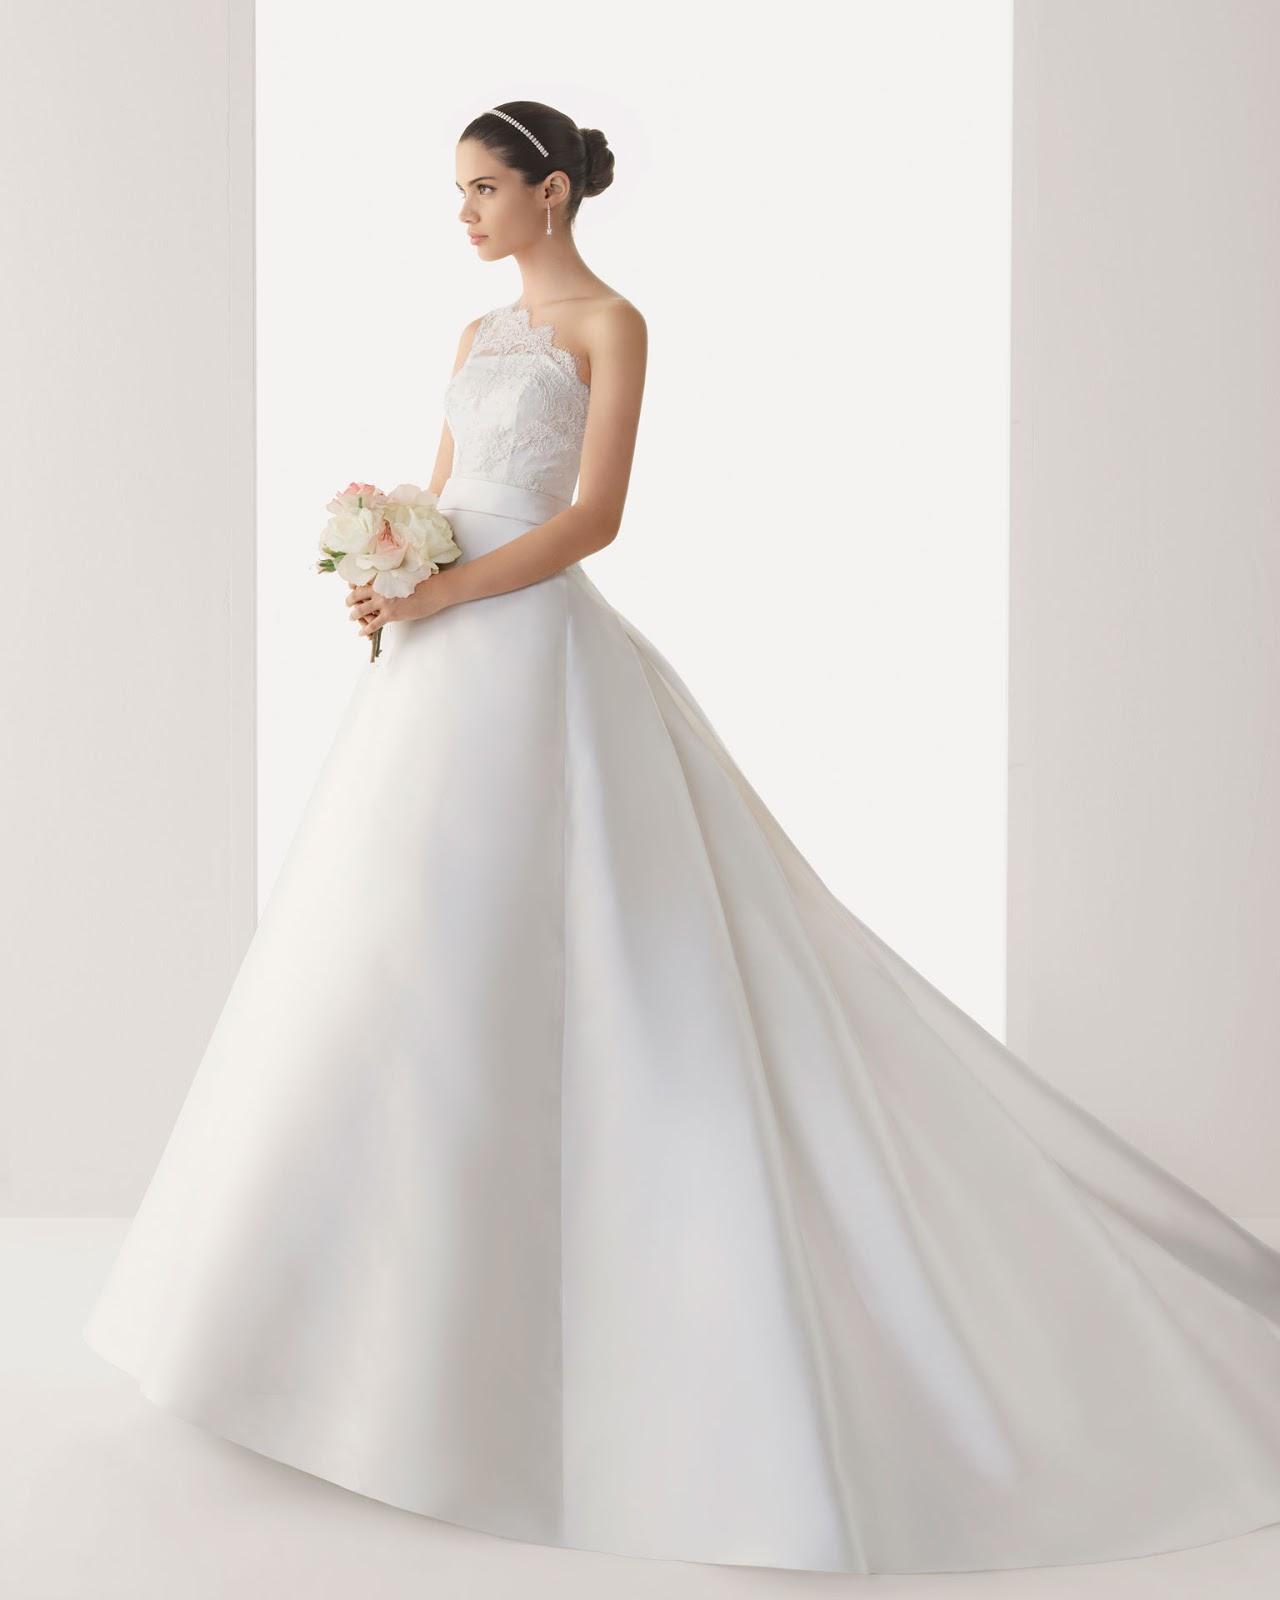 Spring 2013 Wedding Dresses From Rosa Clara Designer Wedding Gowns